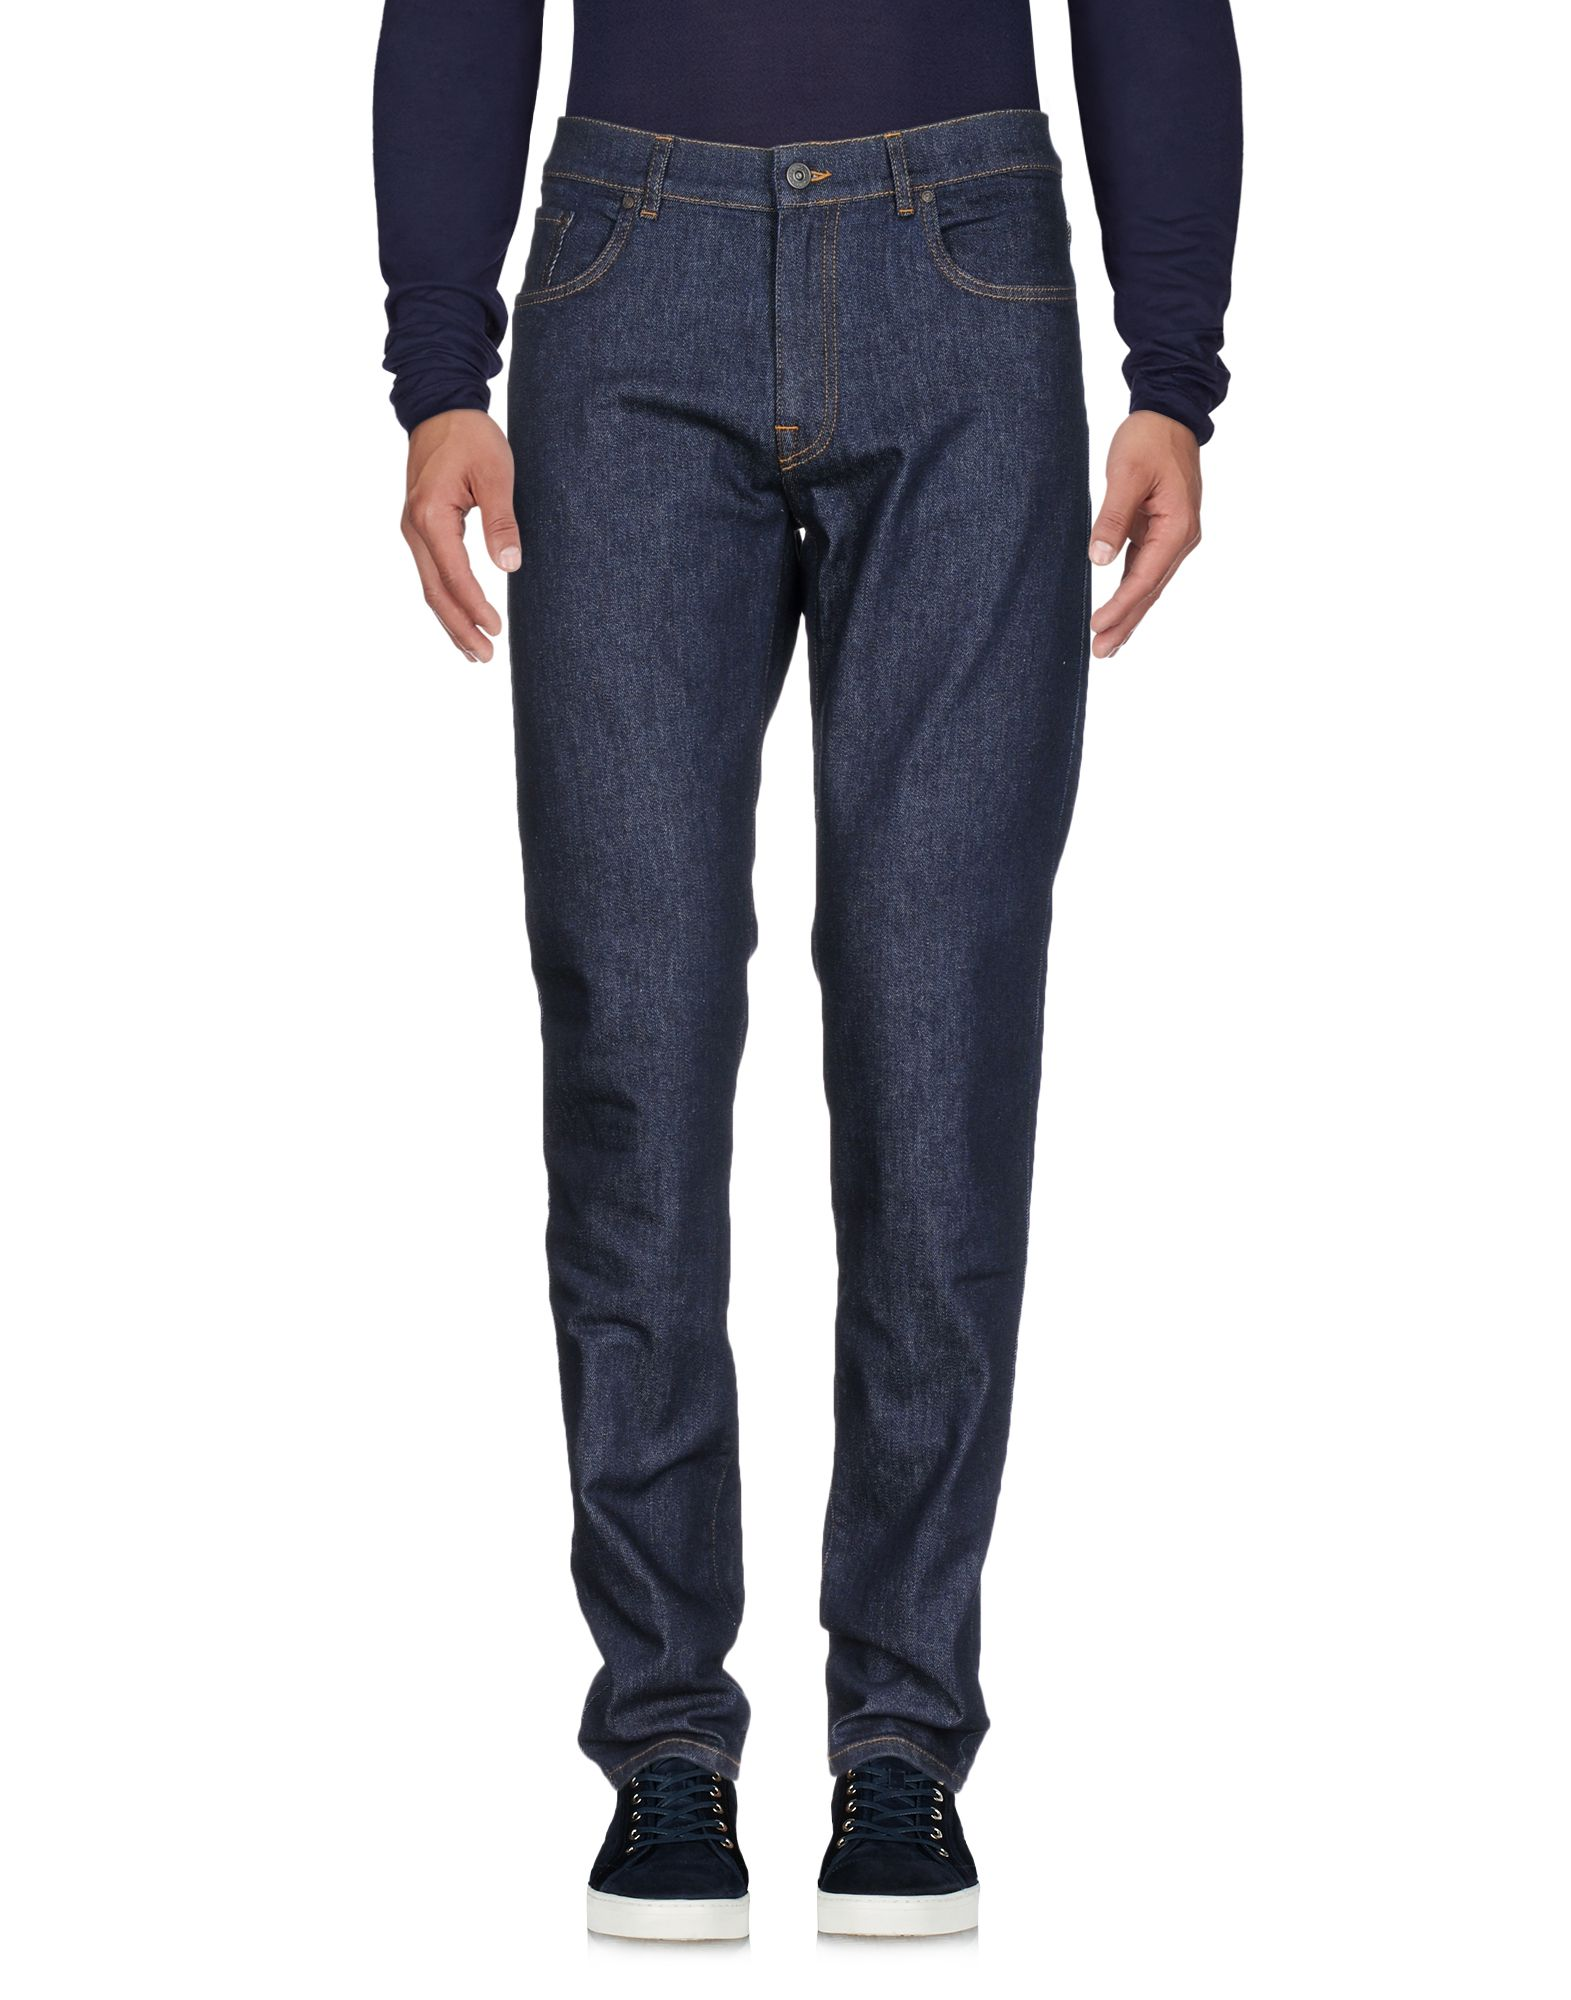 Pantaloni Jeans Kent & Curwen Donna - Acquista online su